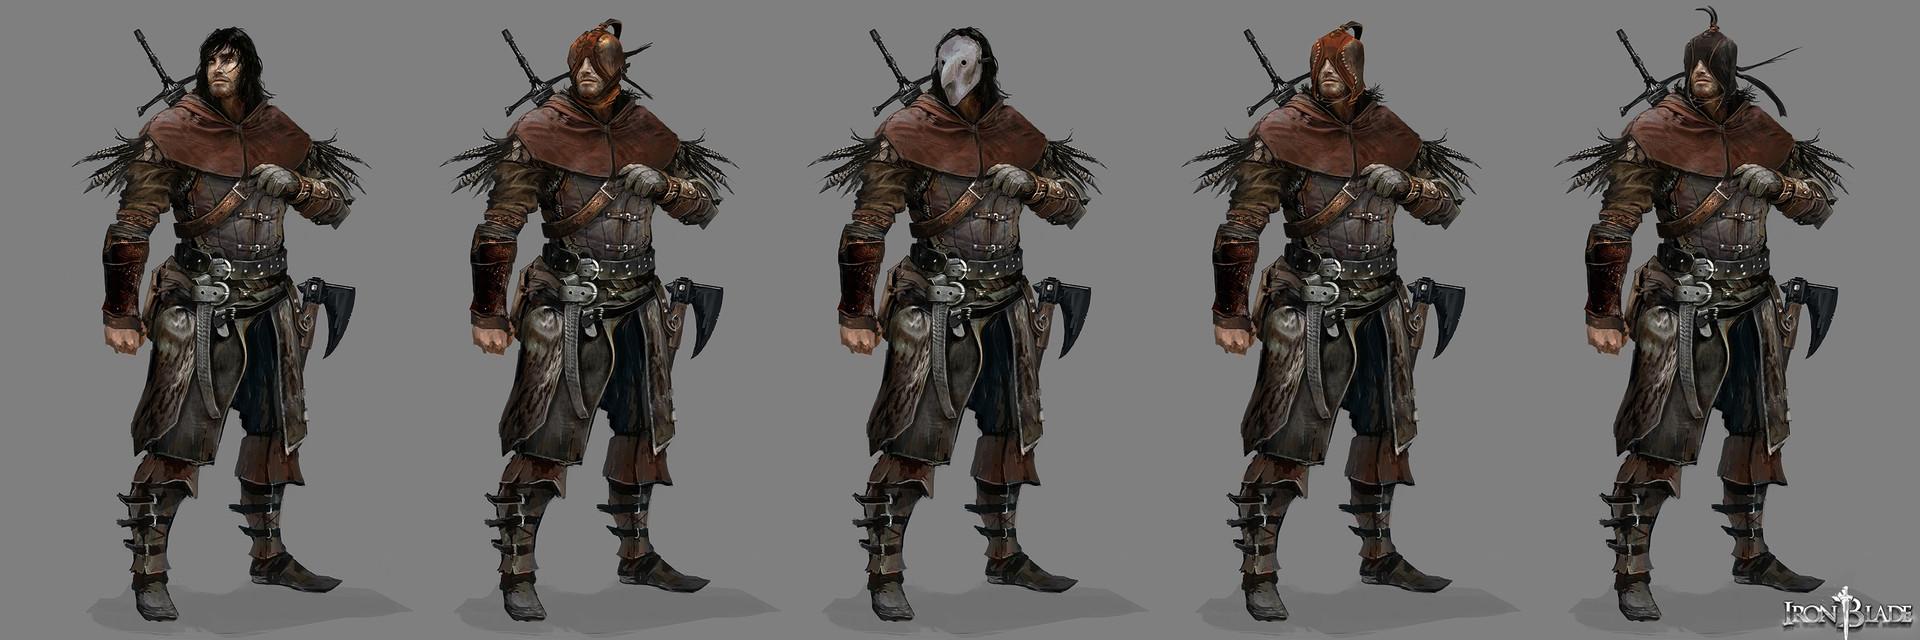 Alexandre chaudret gca character22